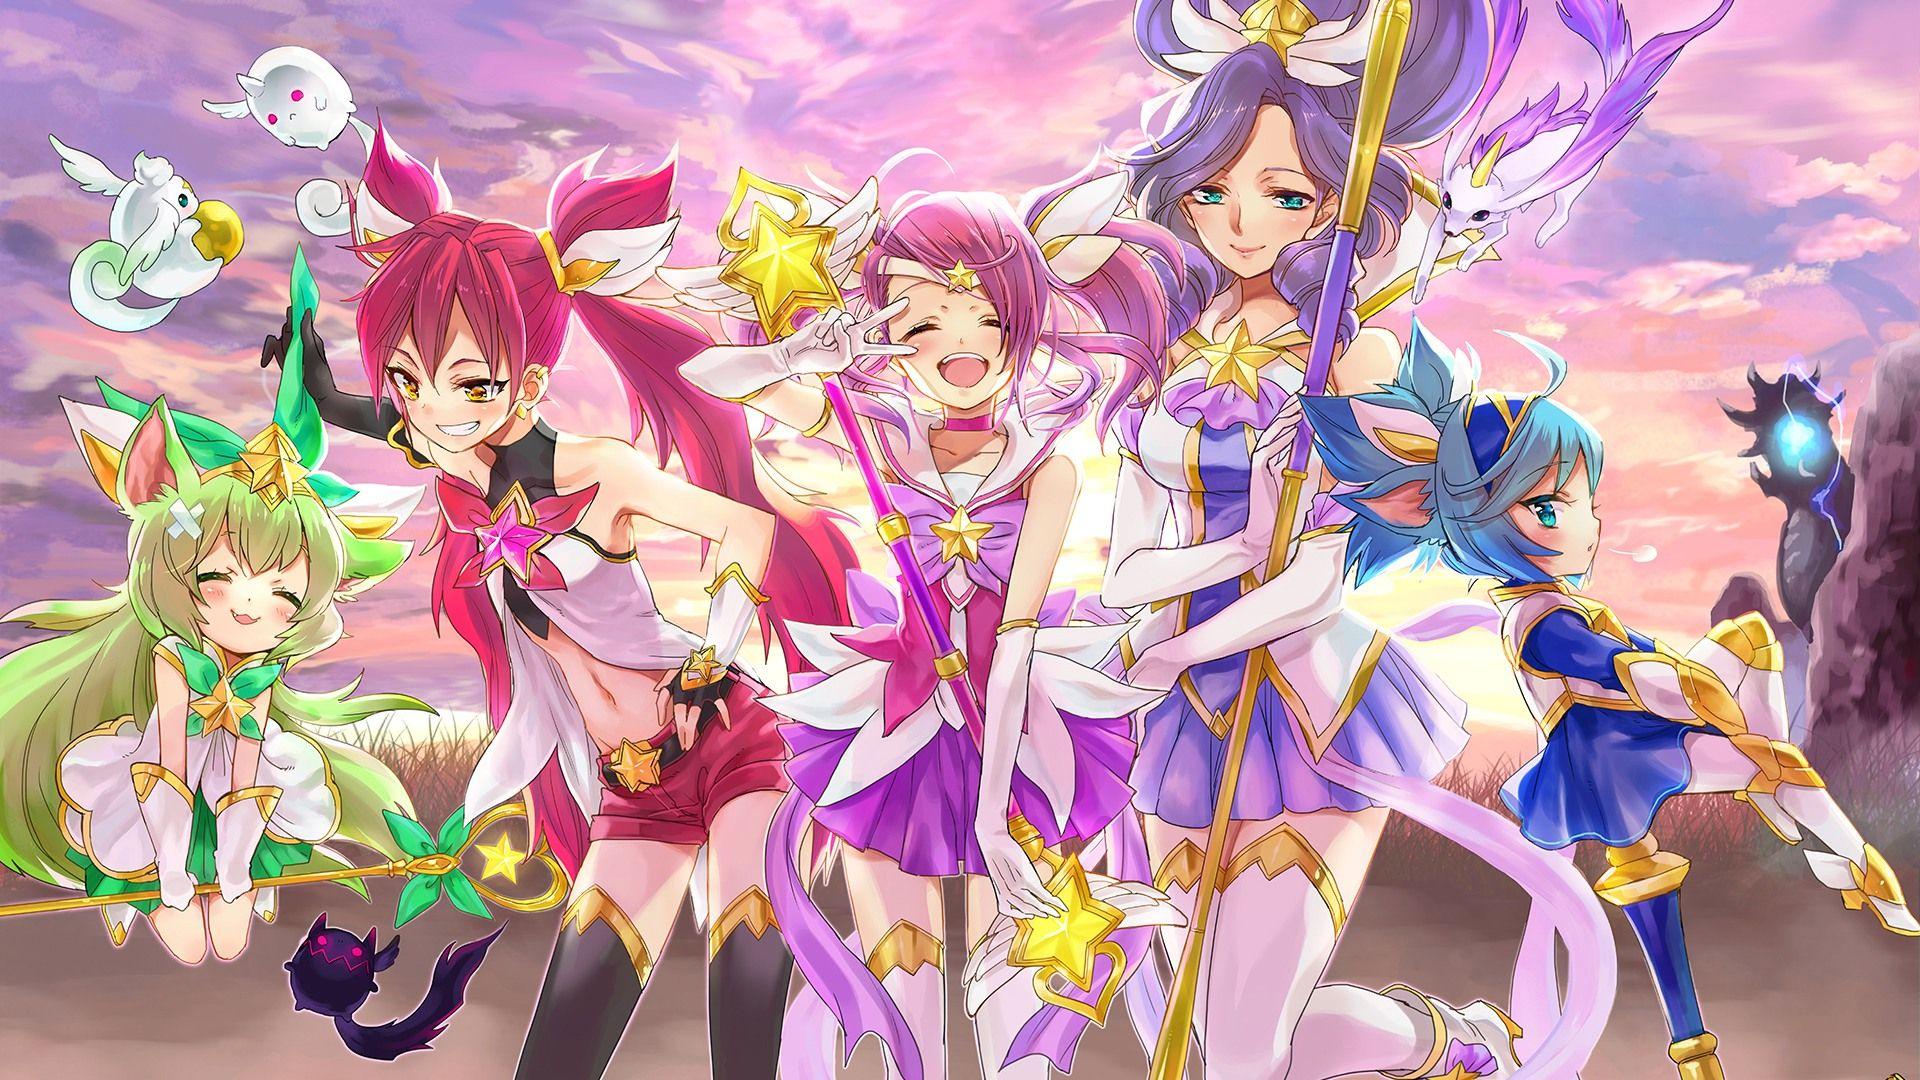 Download wallpaper Star Guardian Anime Cute Girls Lux Jinx Janna 1920x1080